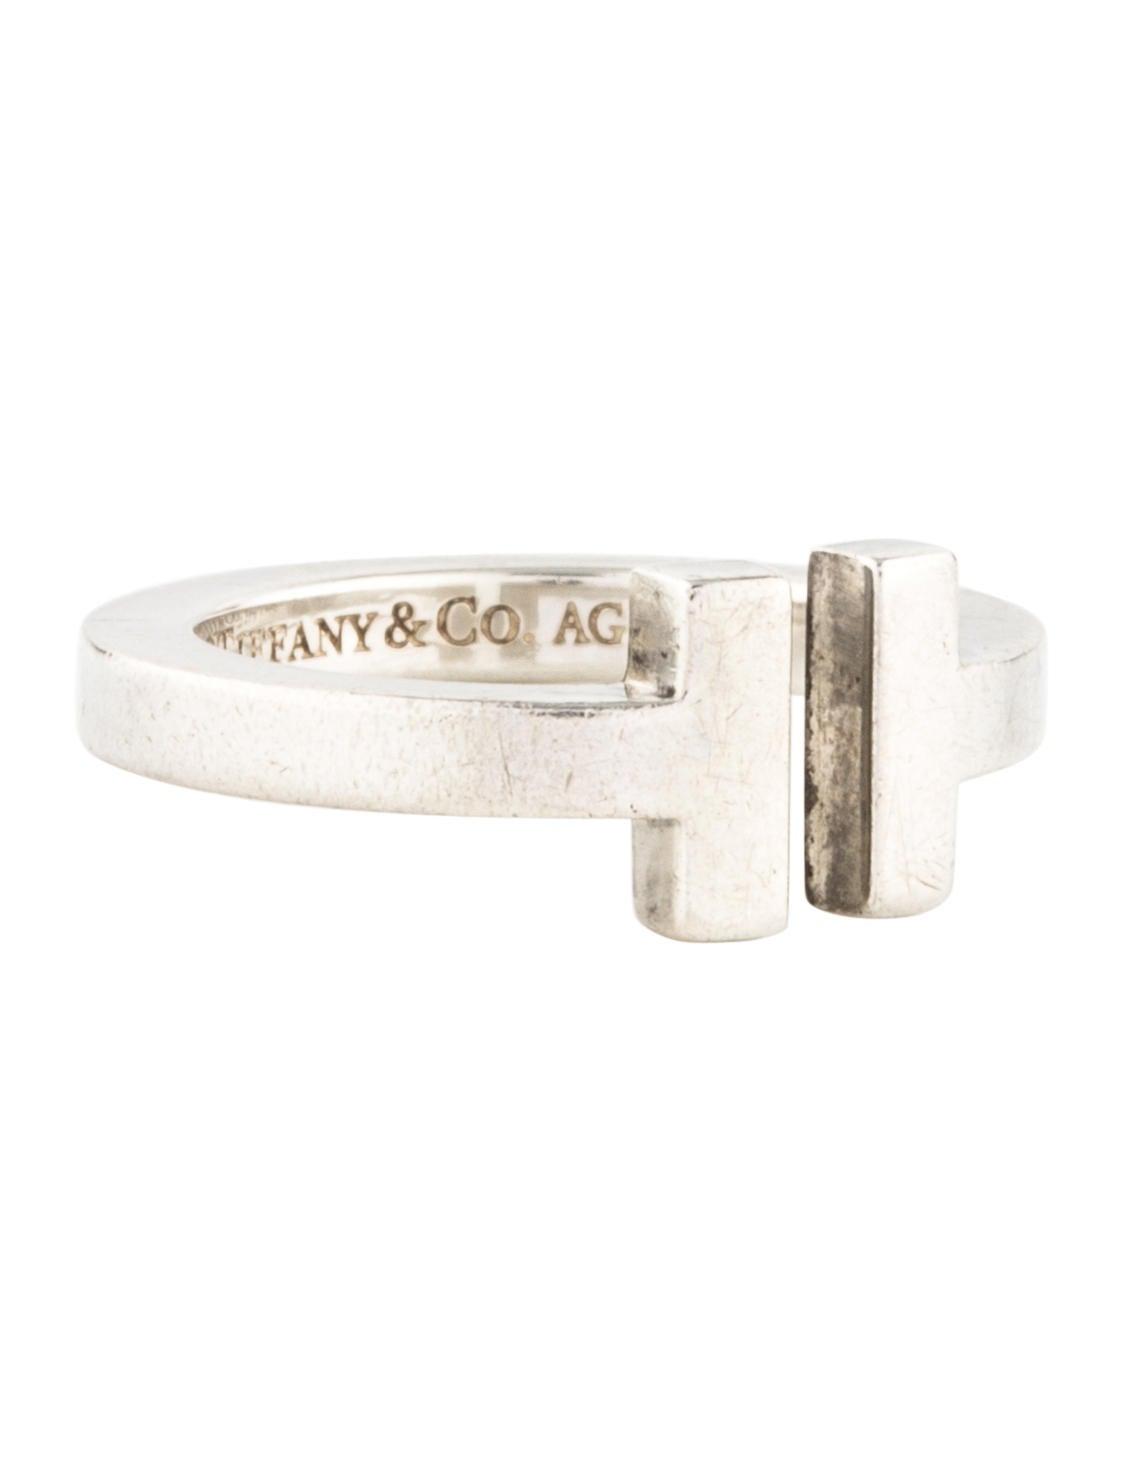 Tiffany & Co. Tiffany T Square Ring - Rings - TIF65750 | The RealReal